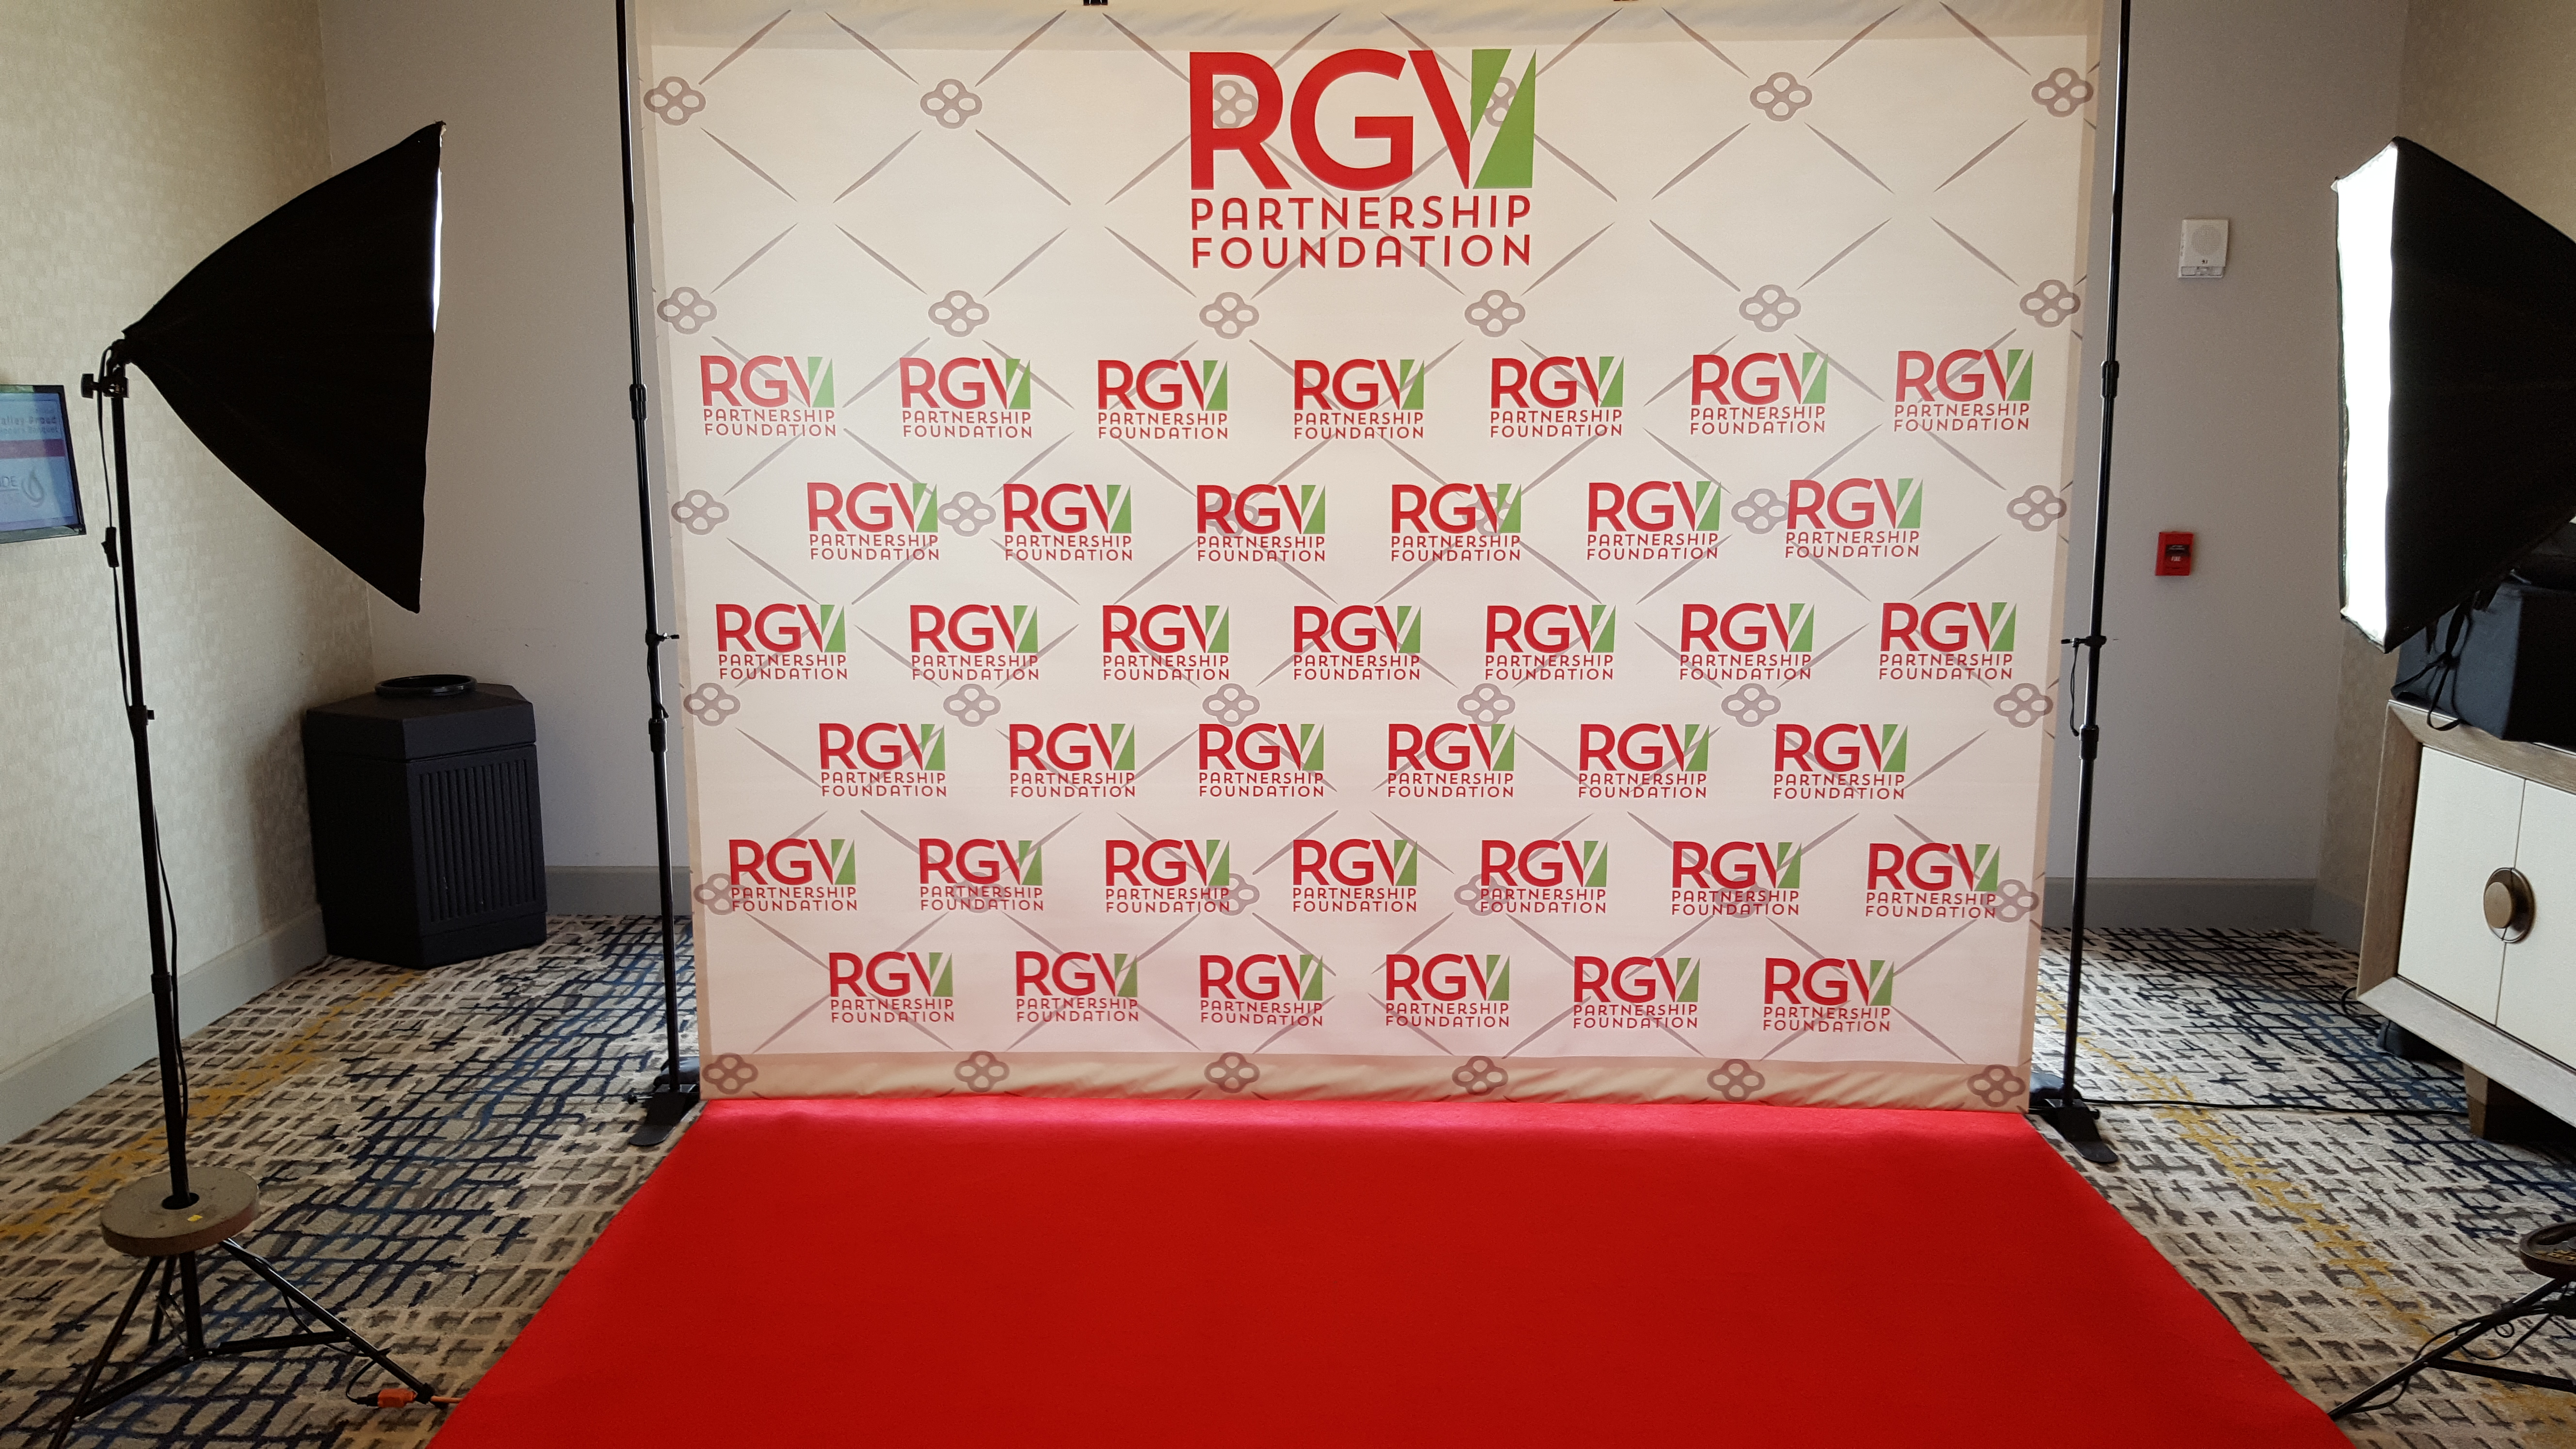 RGV Partnership Foundation